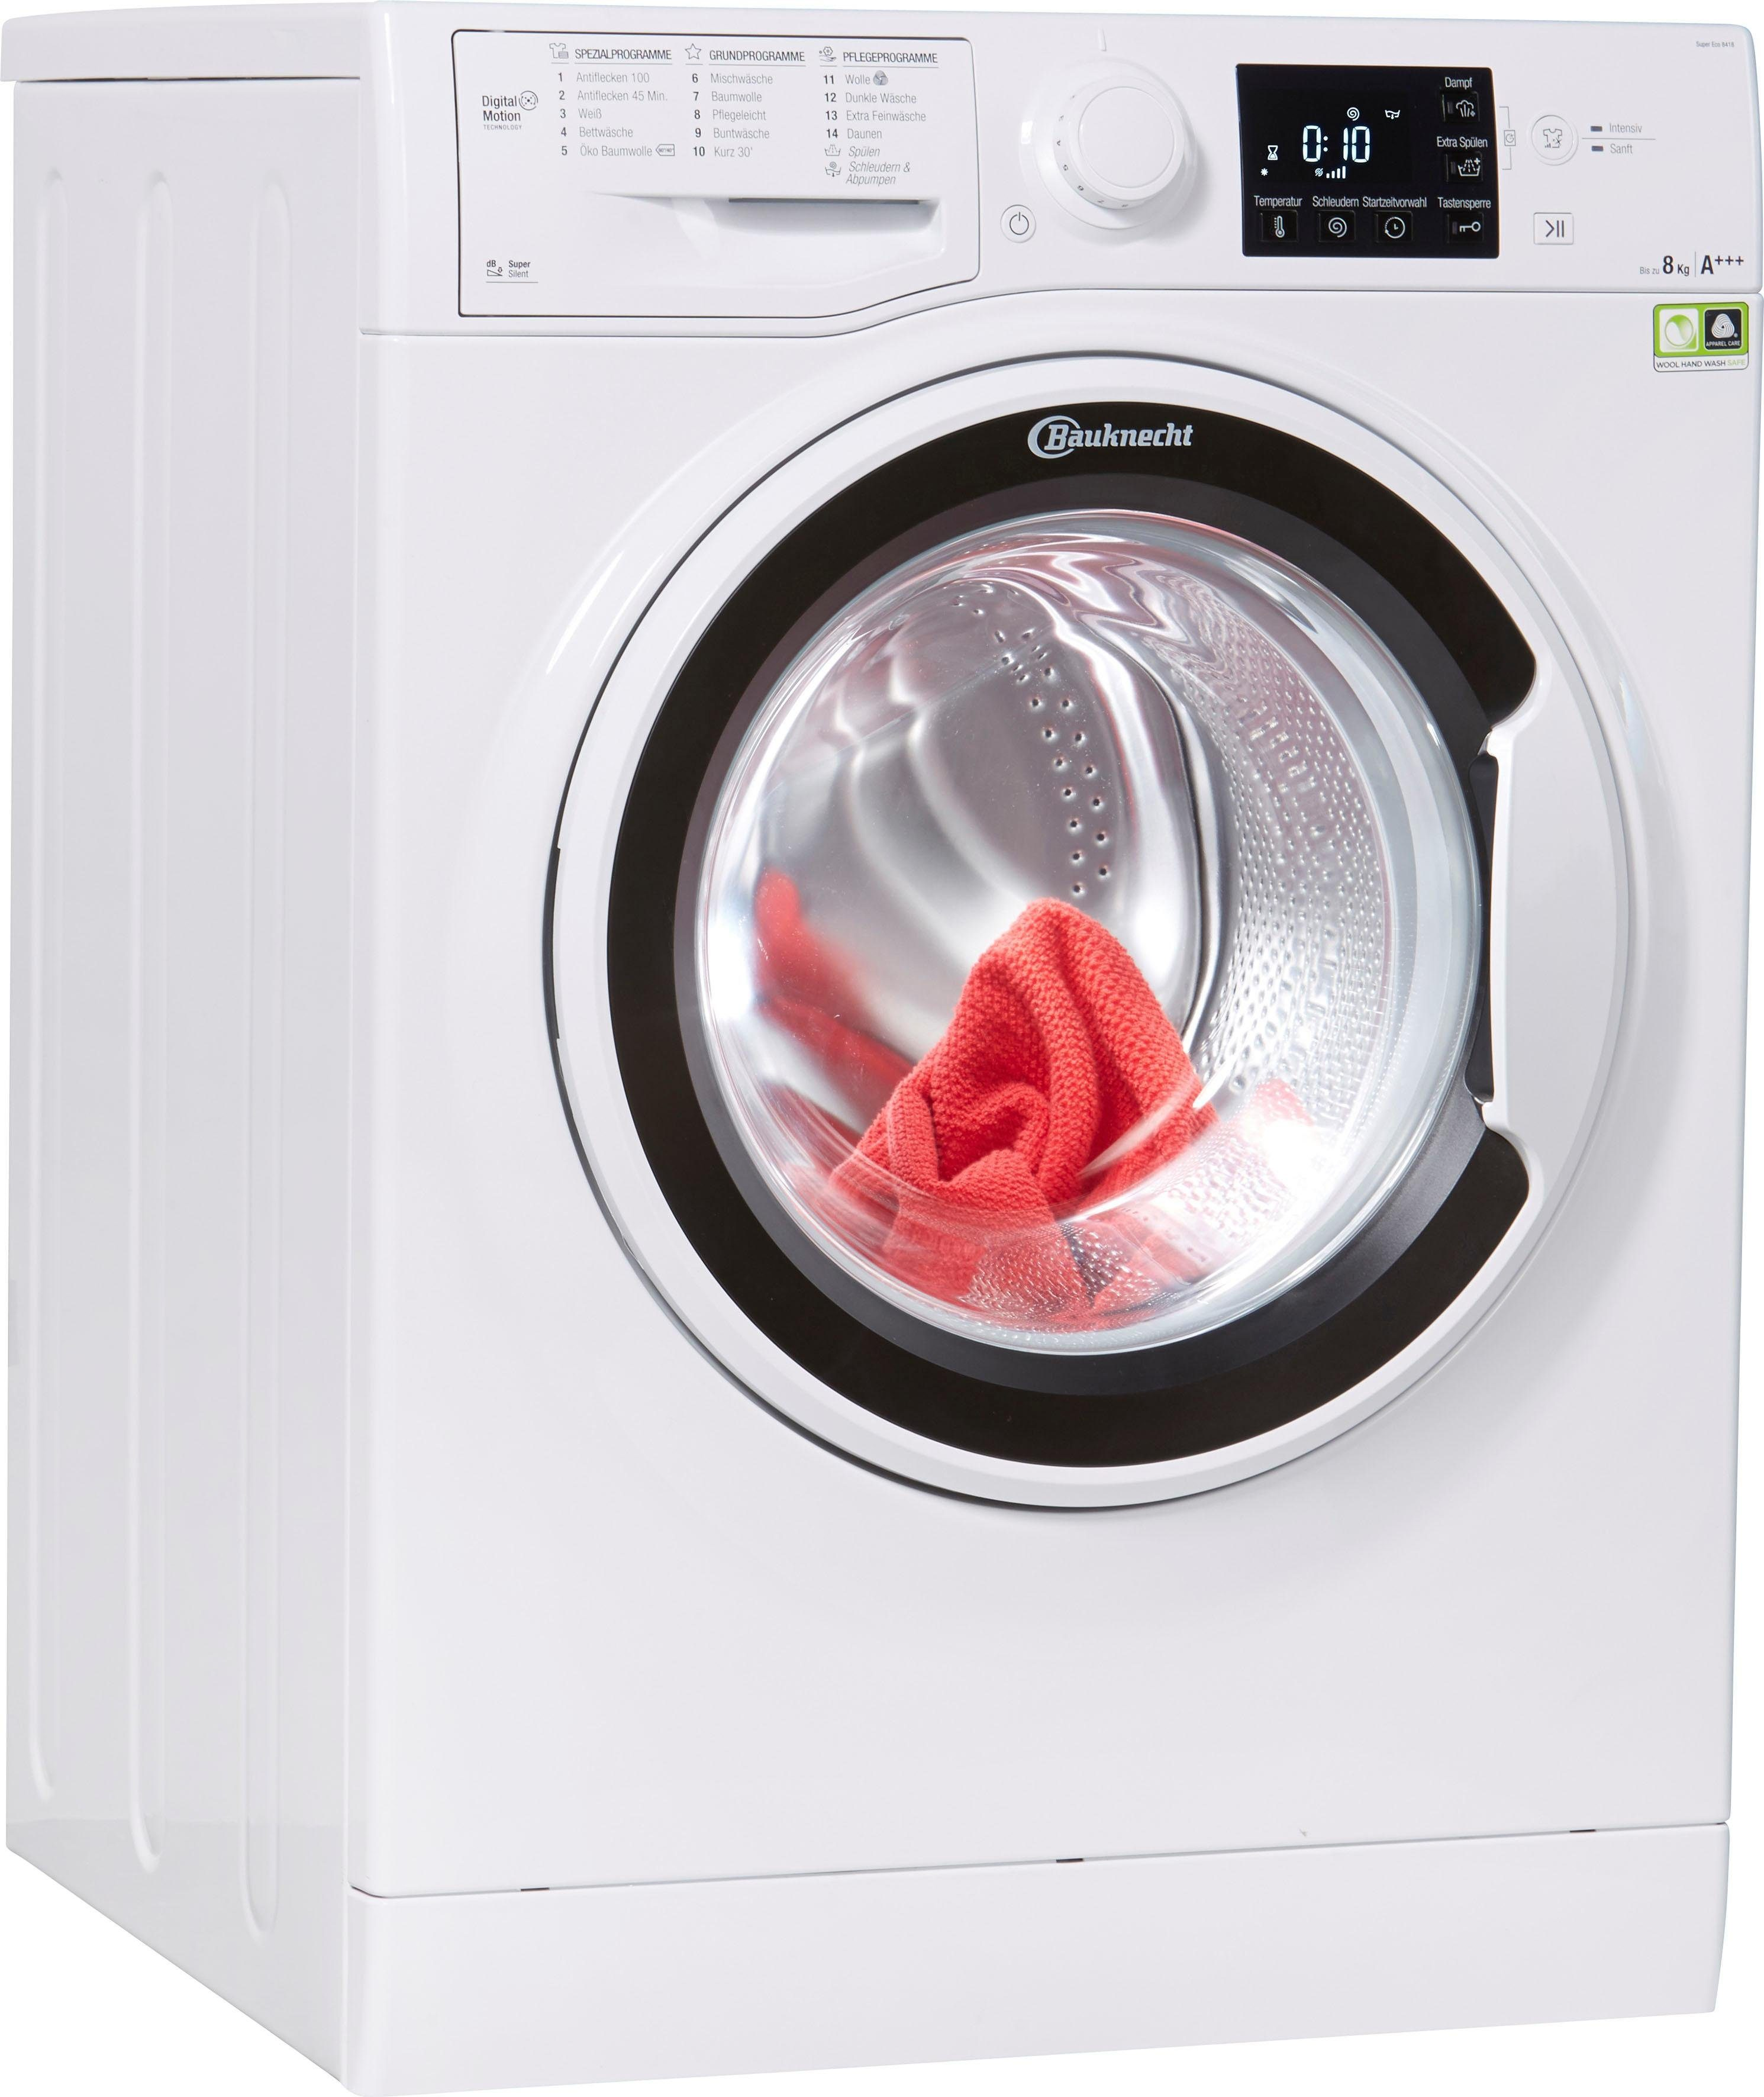 BAUKNECHT Waschmaschine SUPER ECO 8418, 8 kg, 1400 U/Min